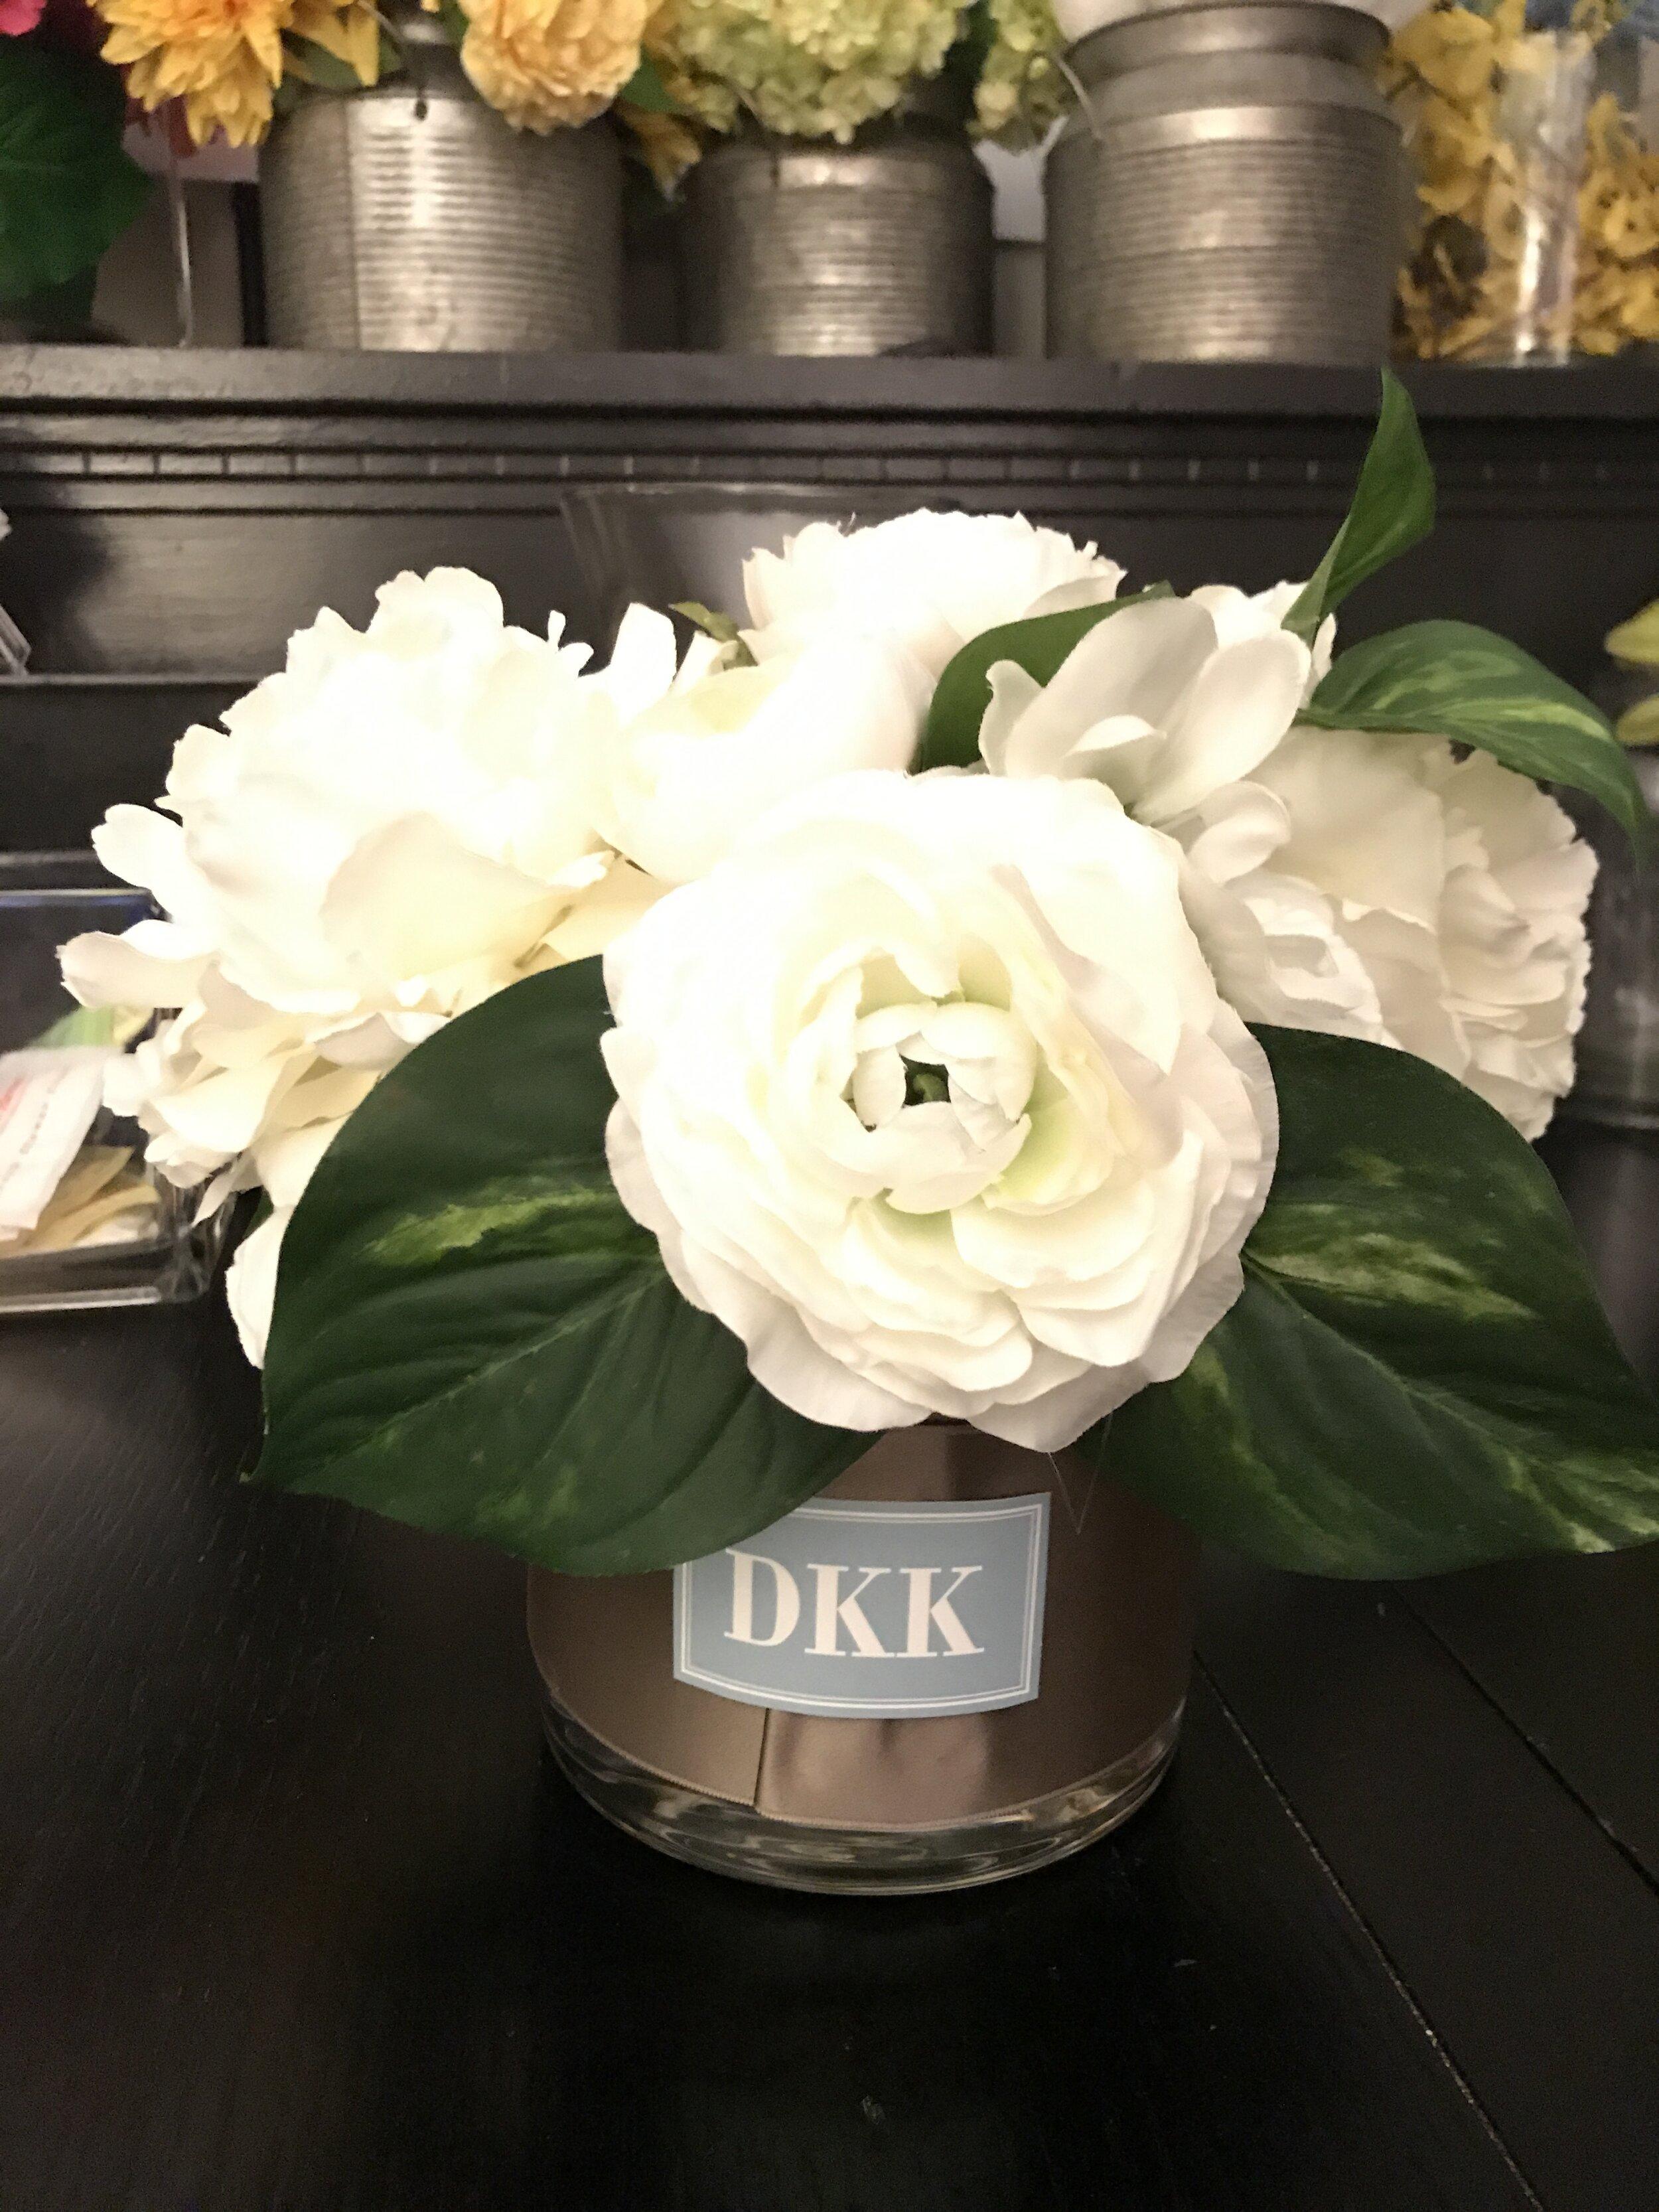 DKK arrang.JPG